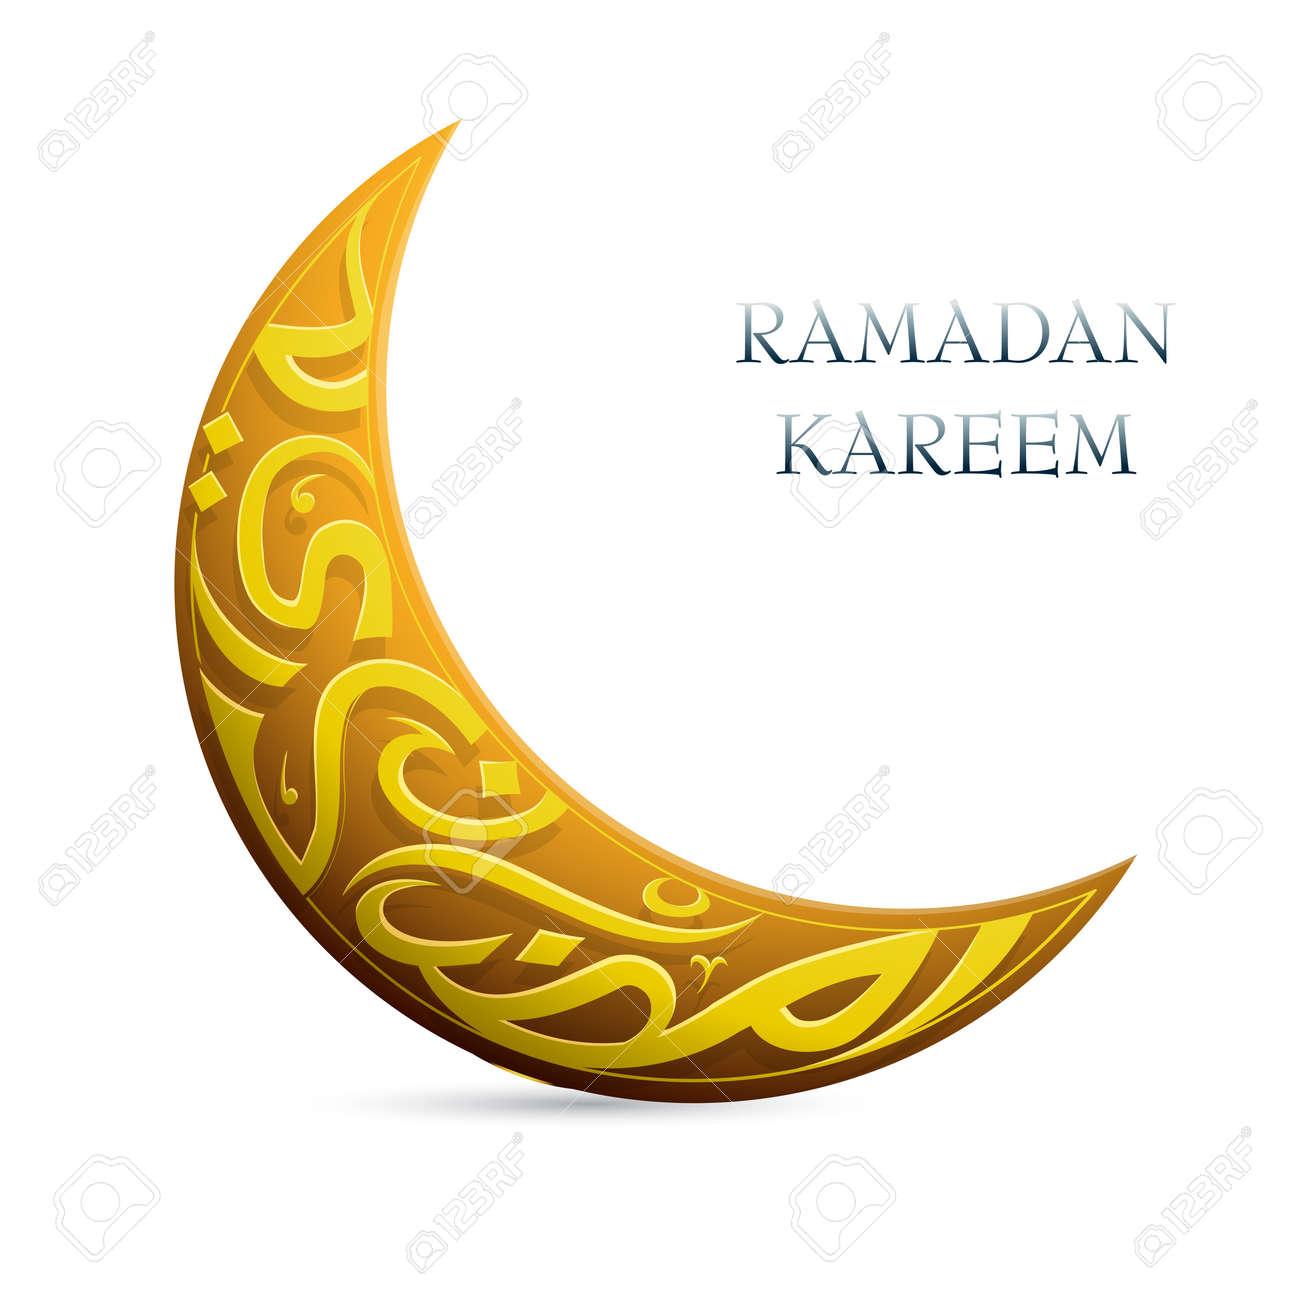 Artistic Islamic calligraphy shaped into crescent moon shape for Ramadan Kareem greetings - 29302360